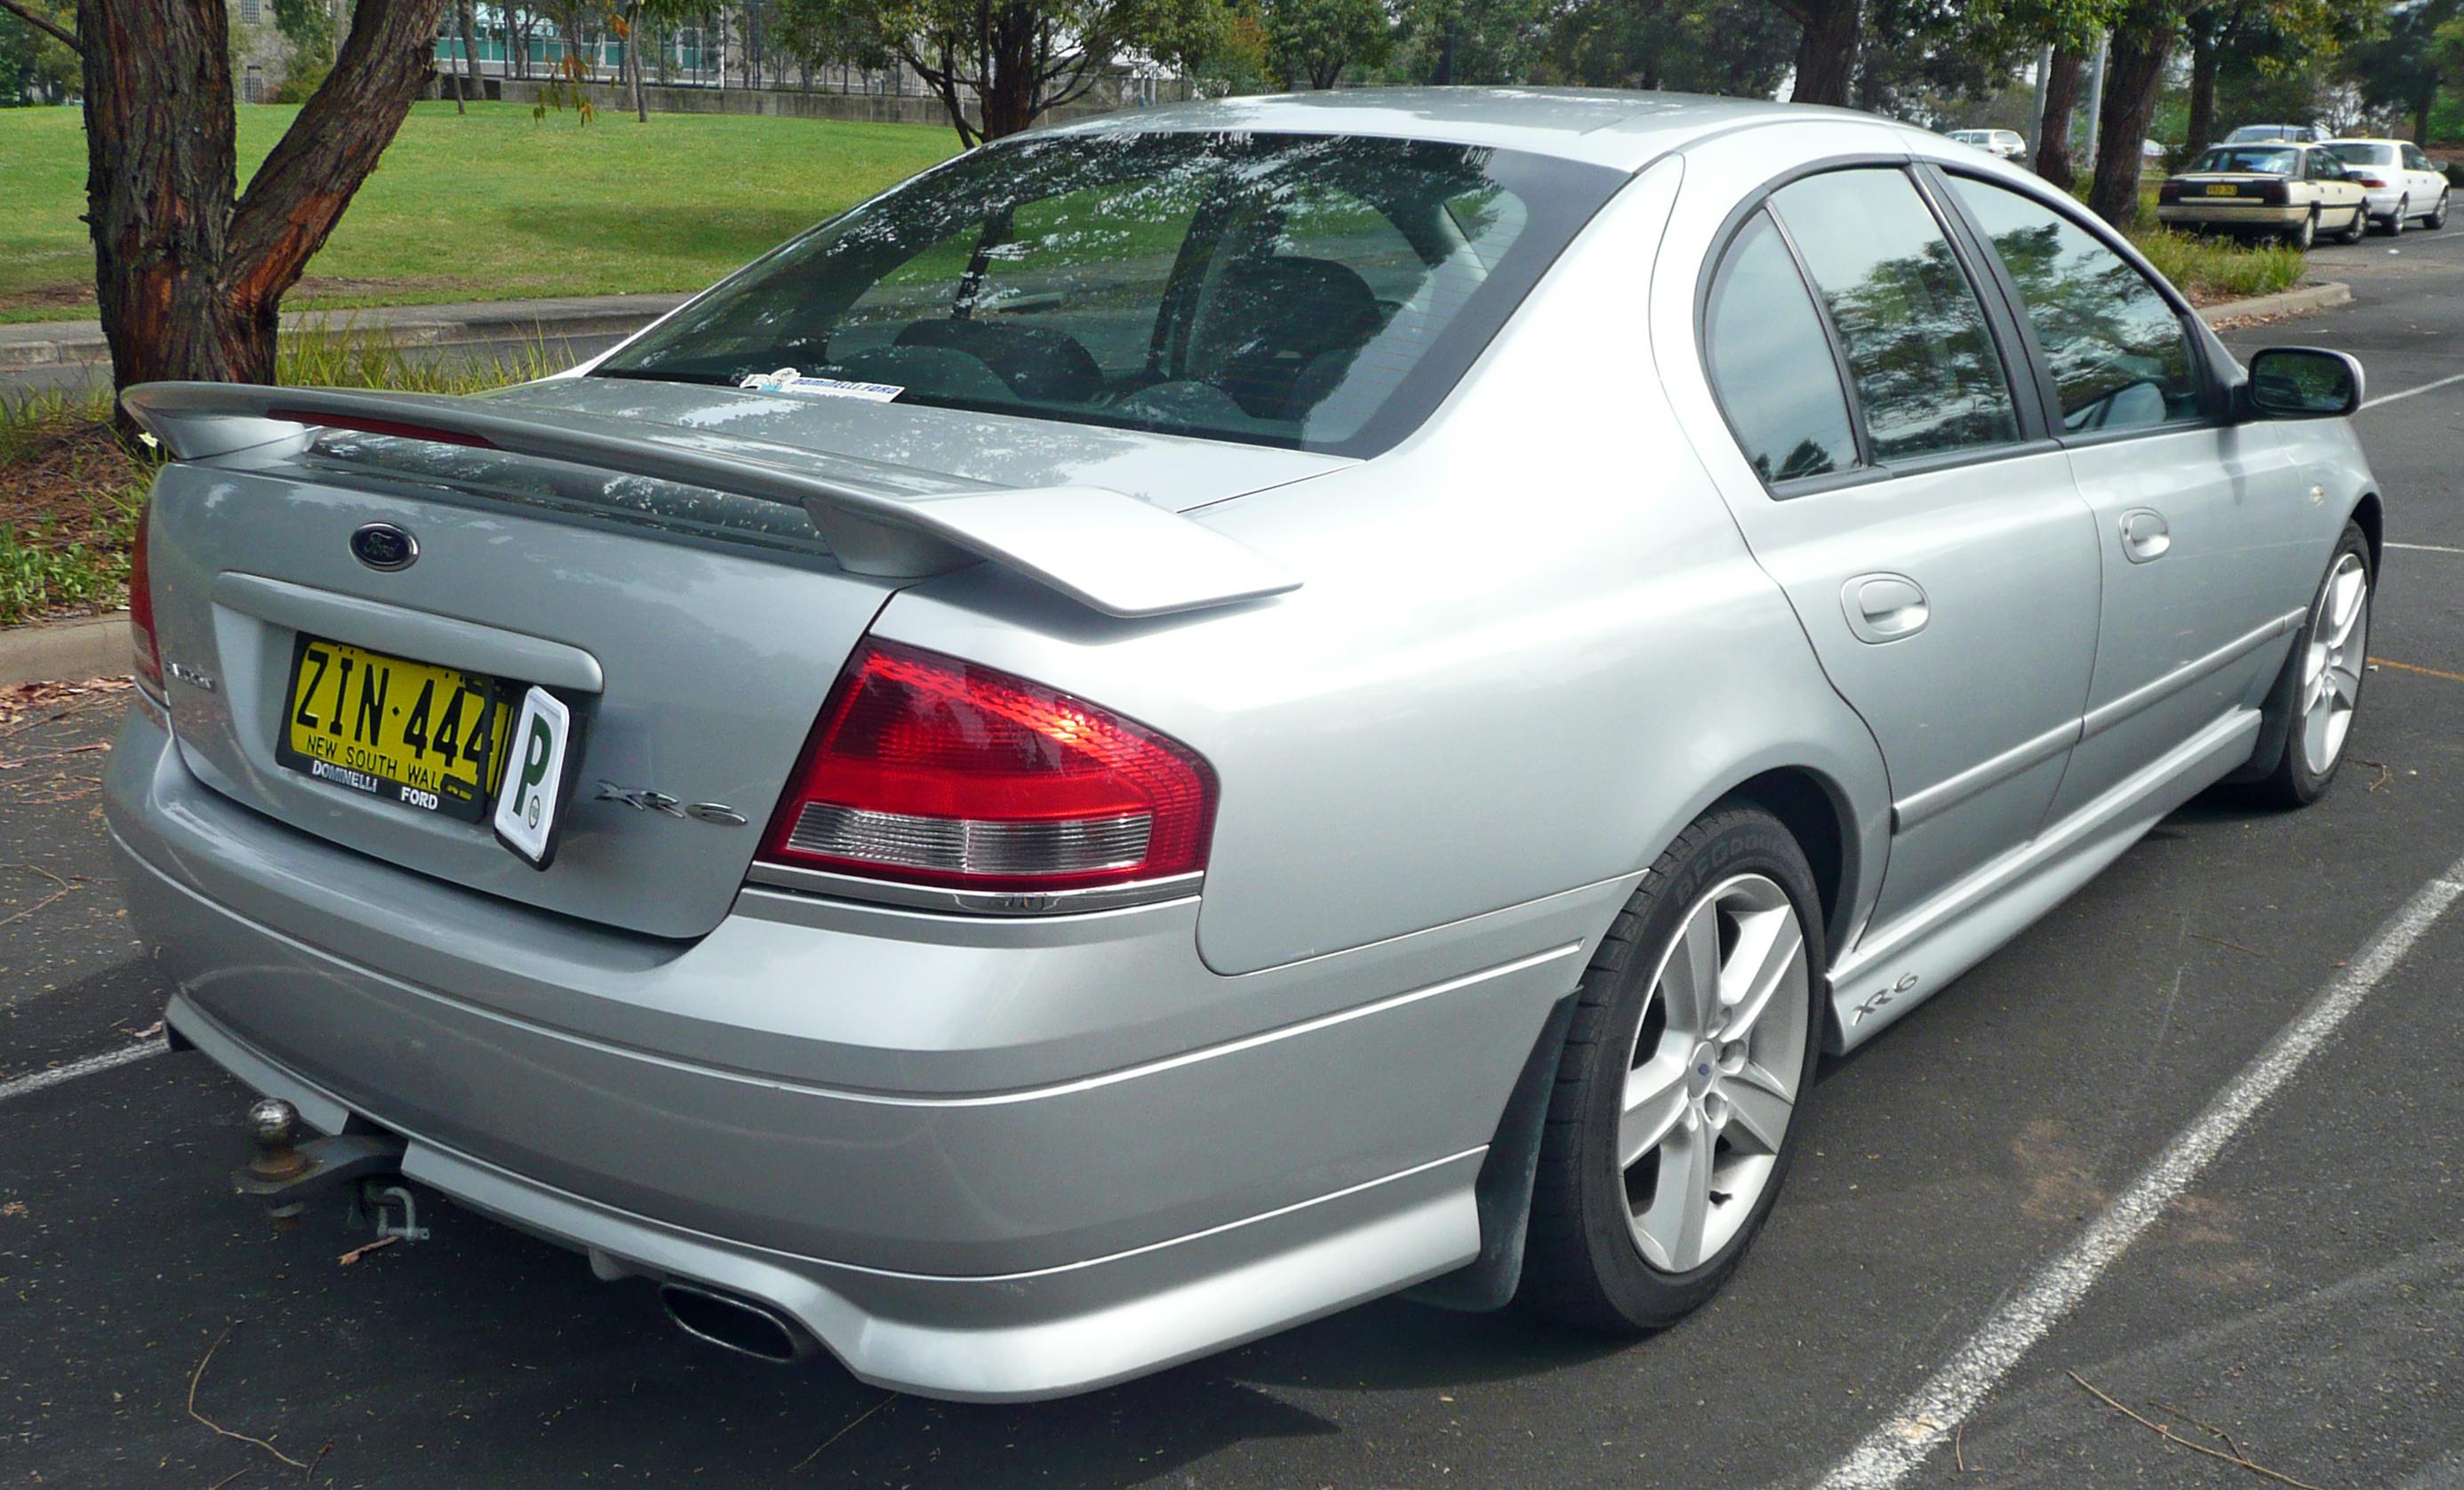 Superb File:2004 Ford Falcon (BA) XR6 Sedan (2009 11 16